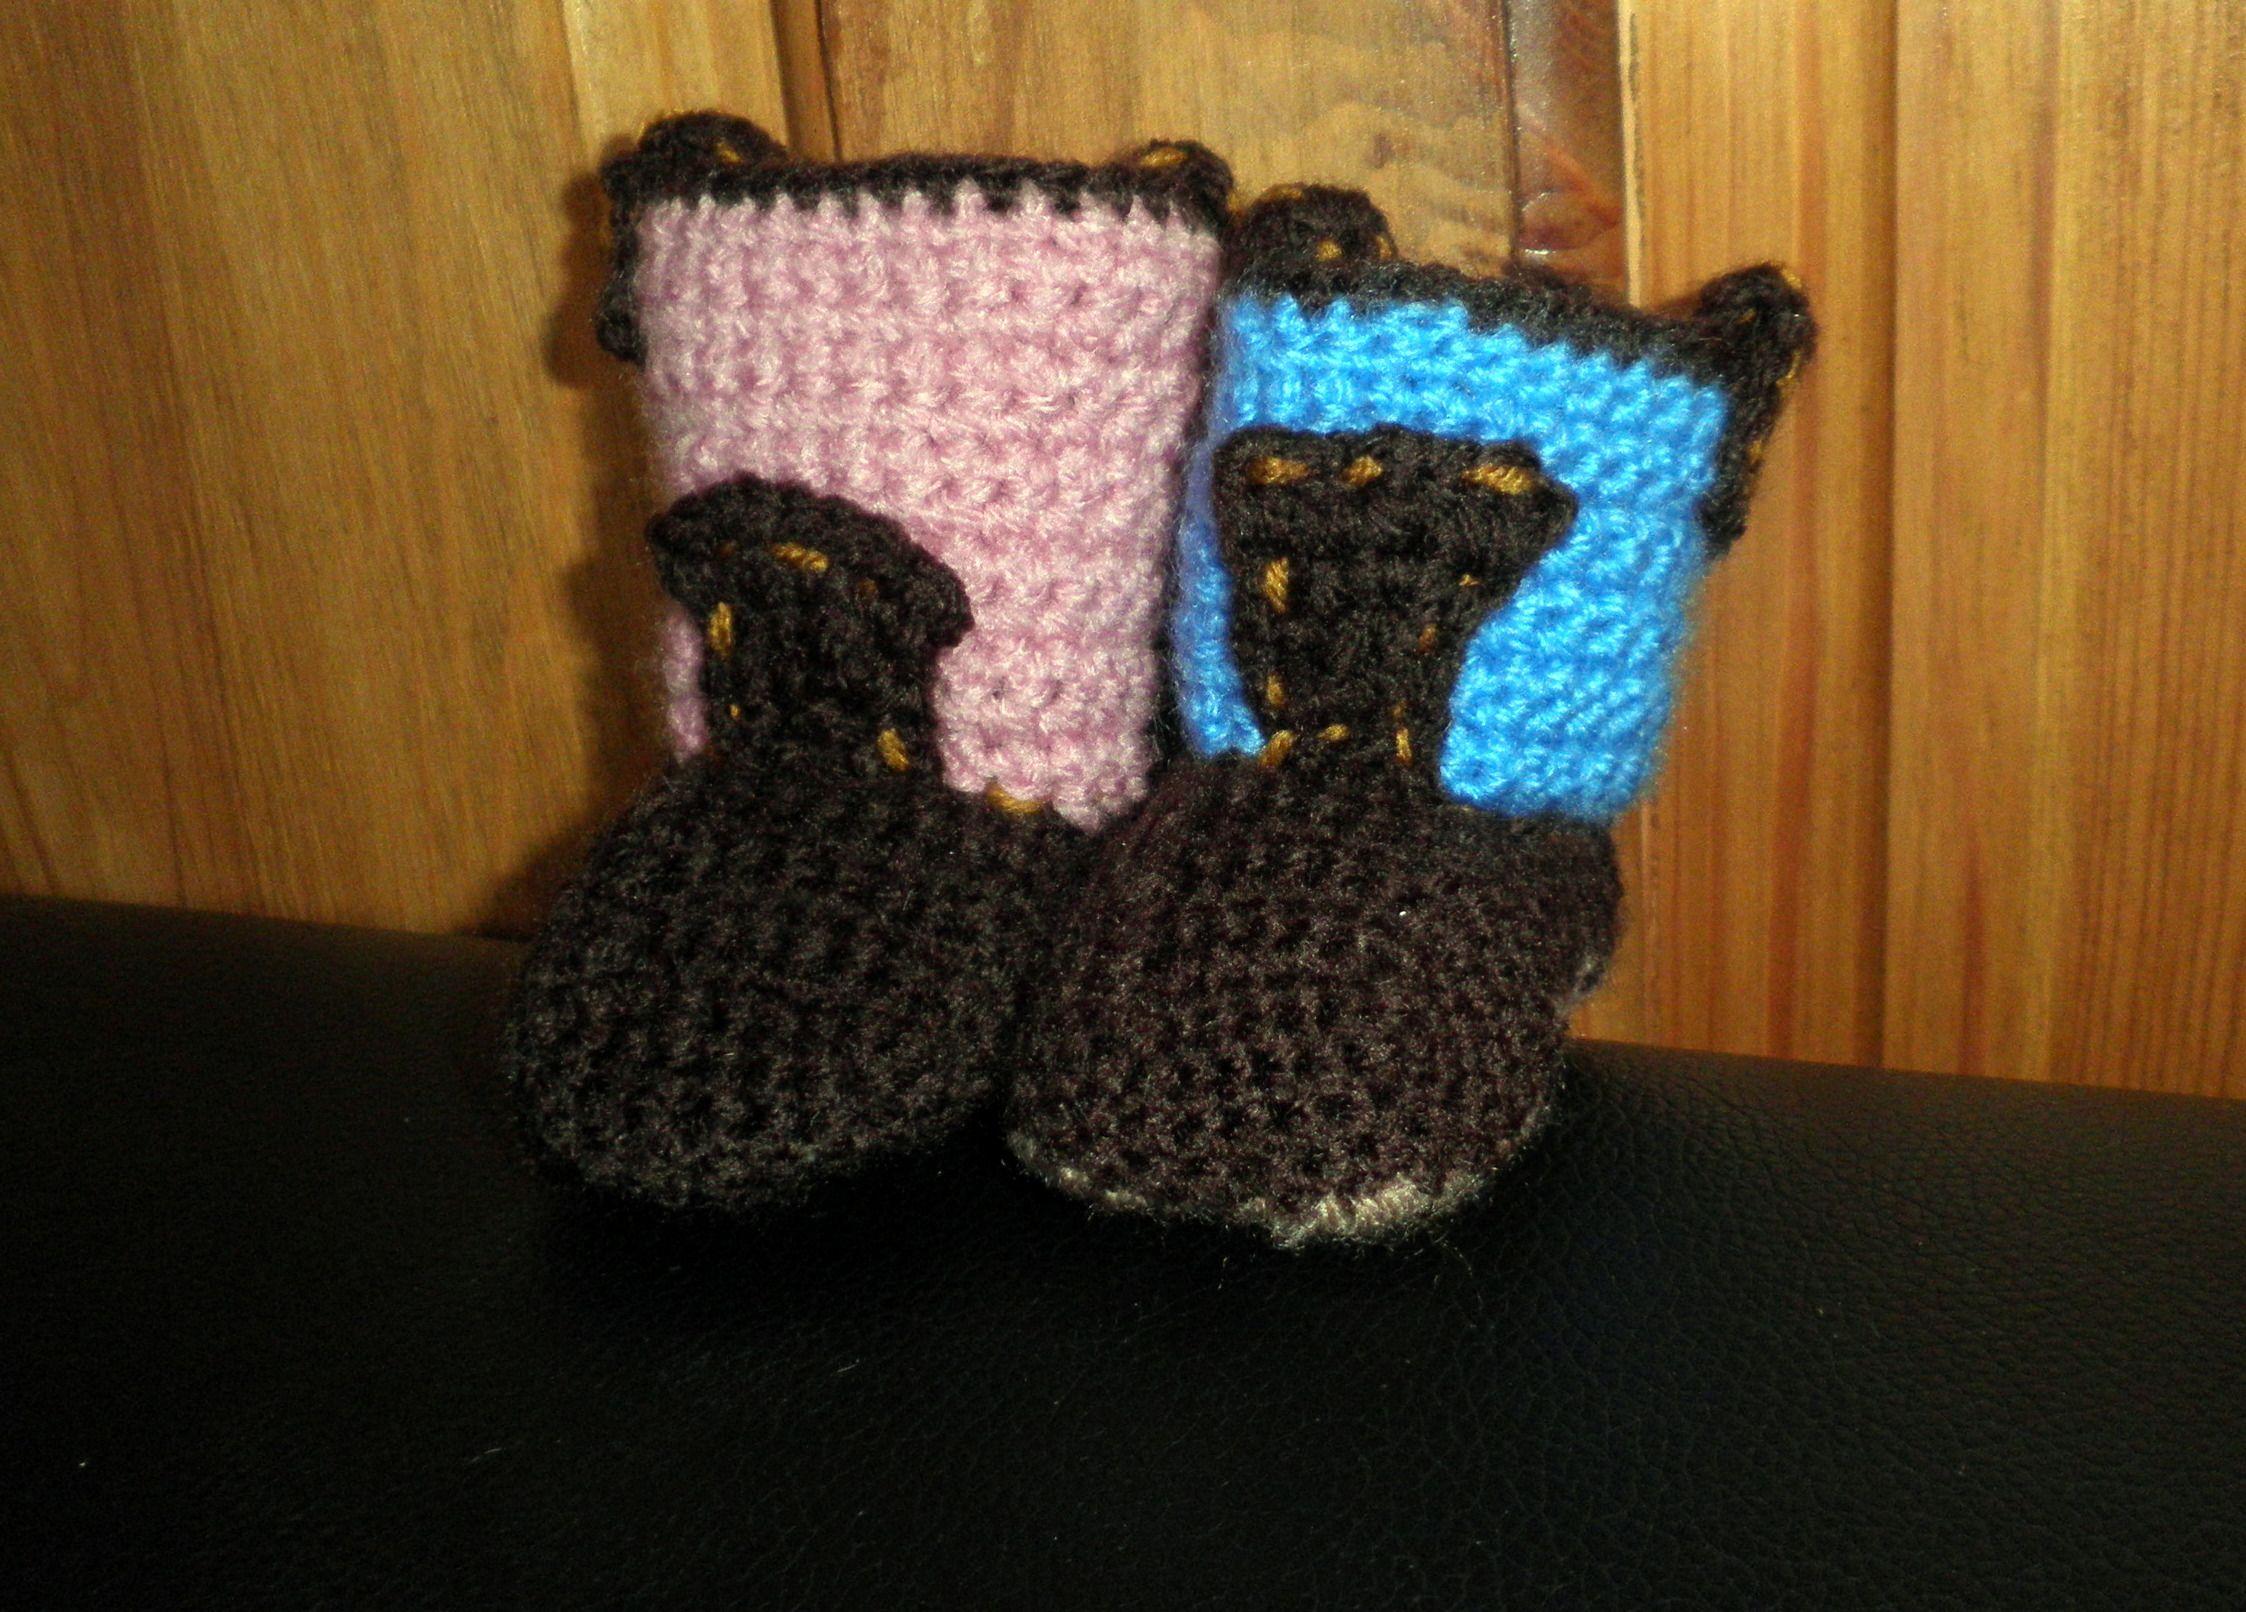 facebook: crochet created homemade lif